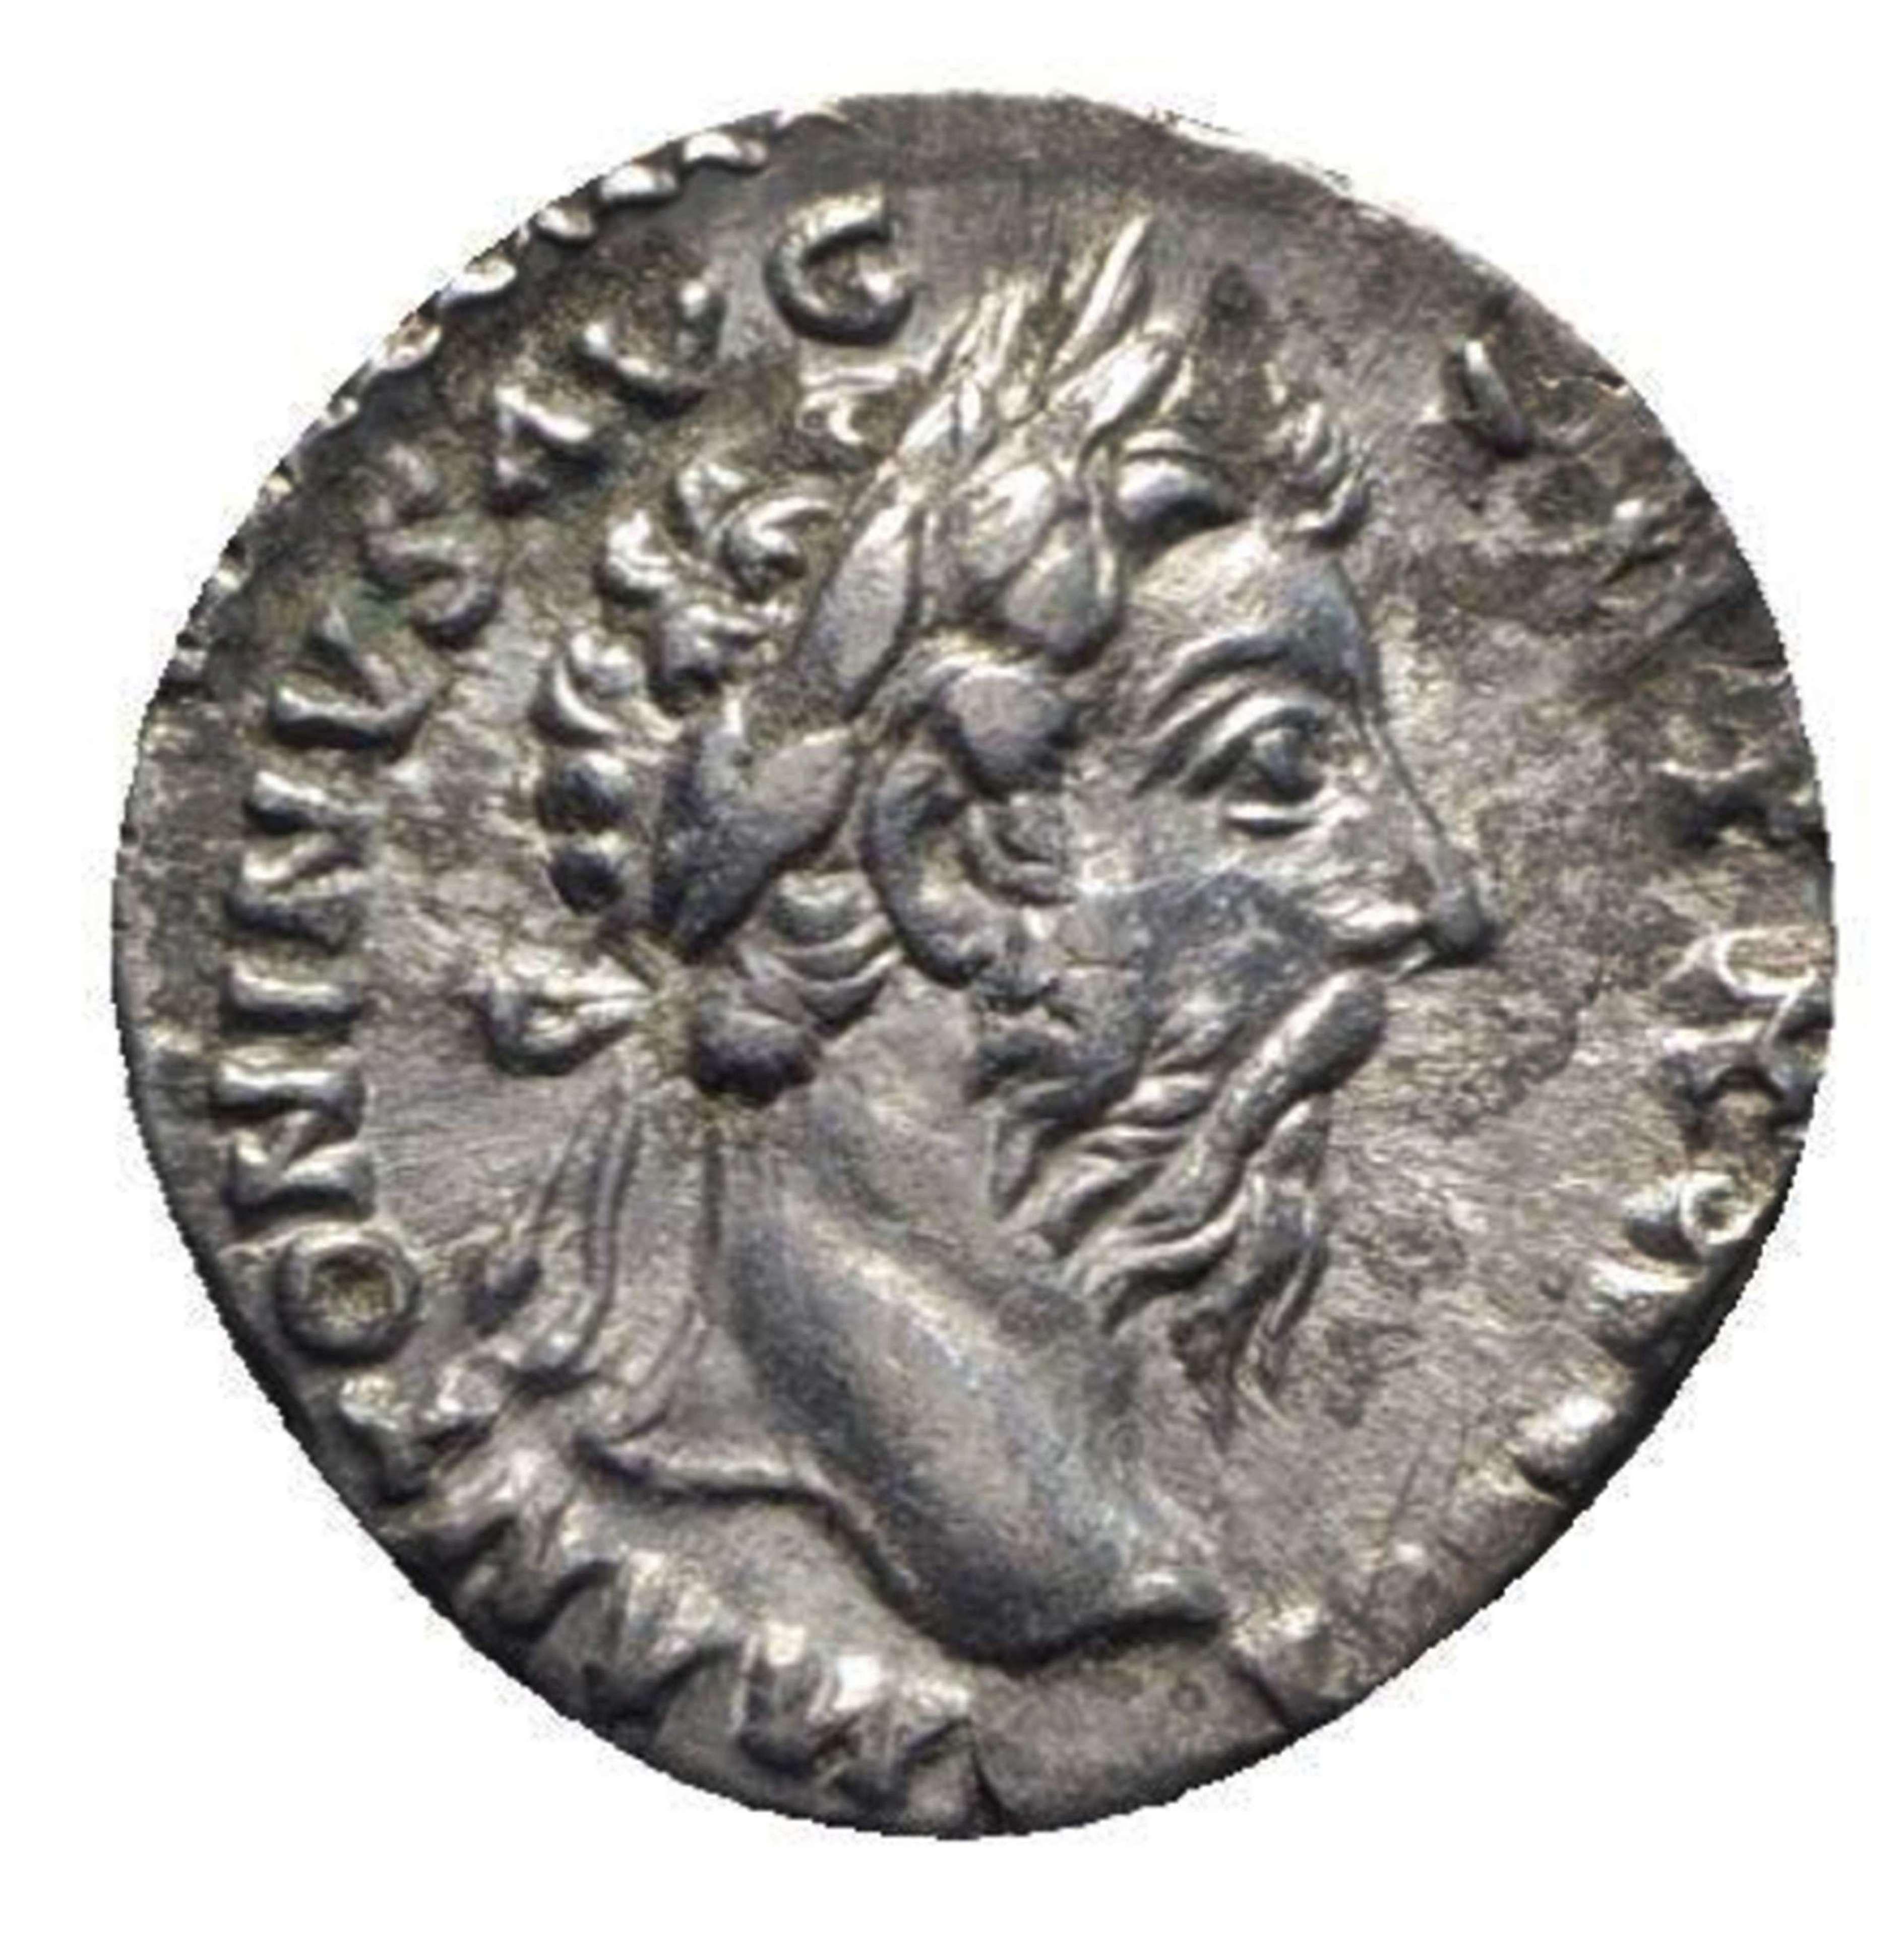 Ancient Roman Silver Denarius of Emperor Marcus Aurelius / Health